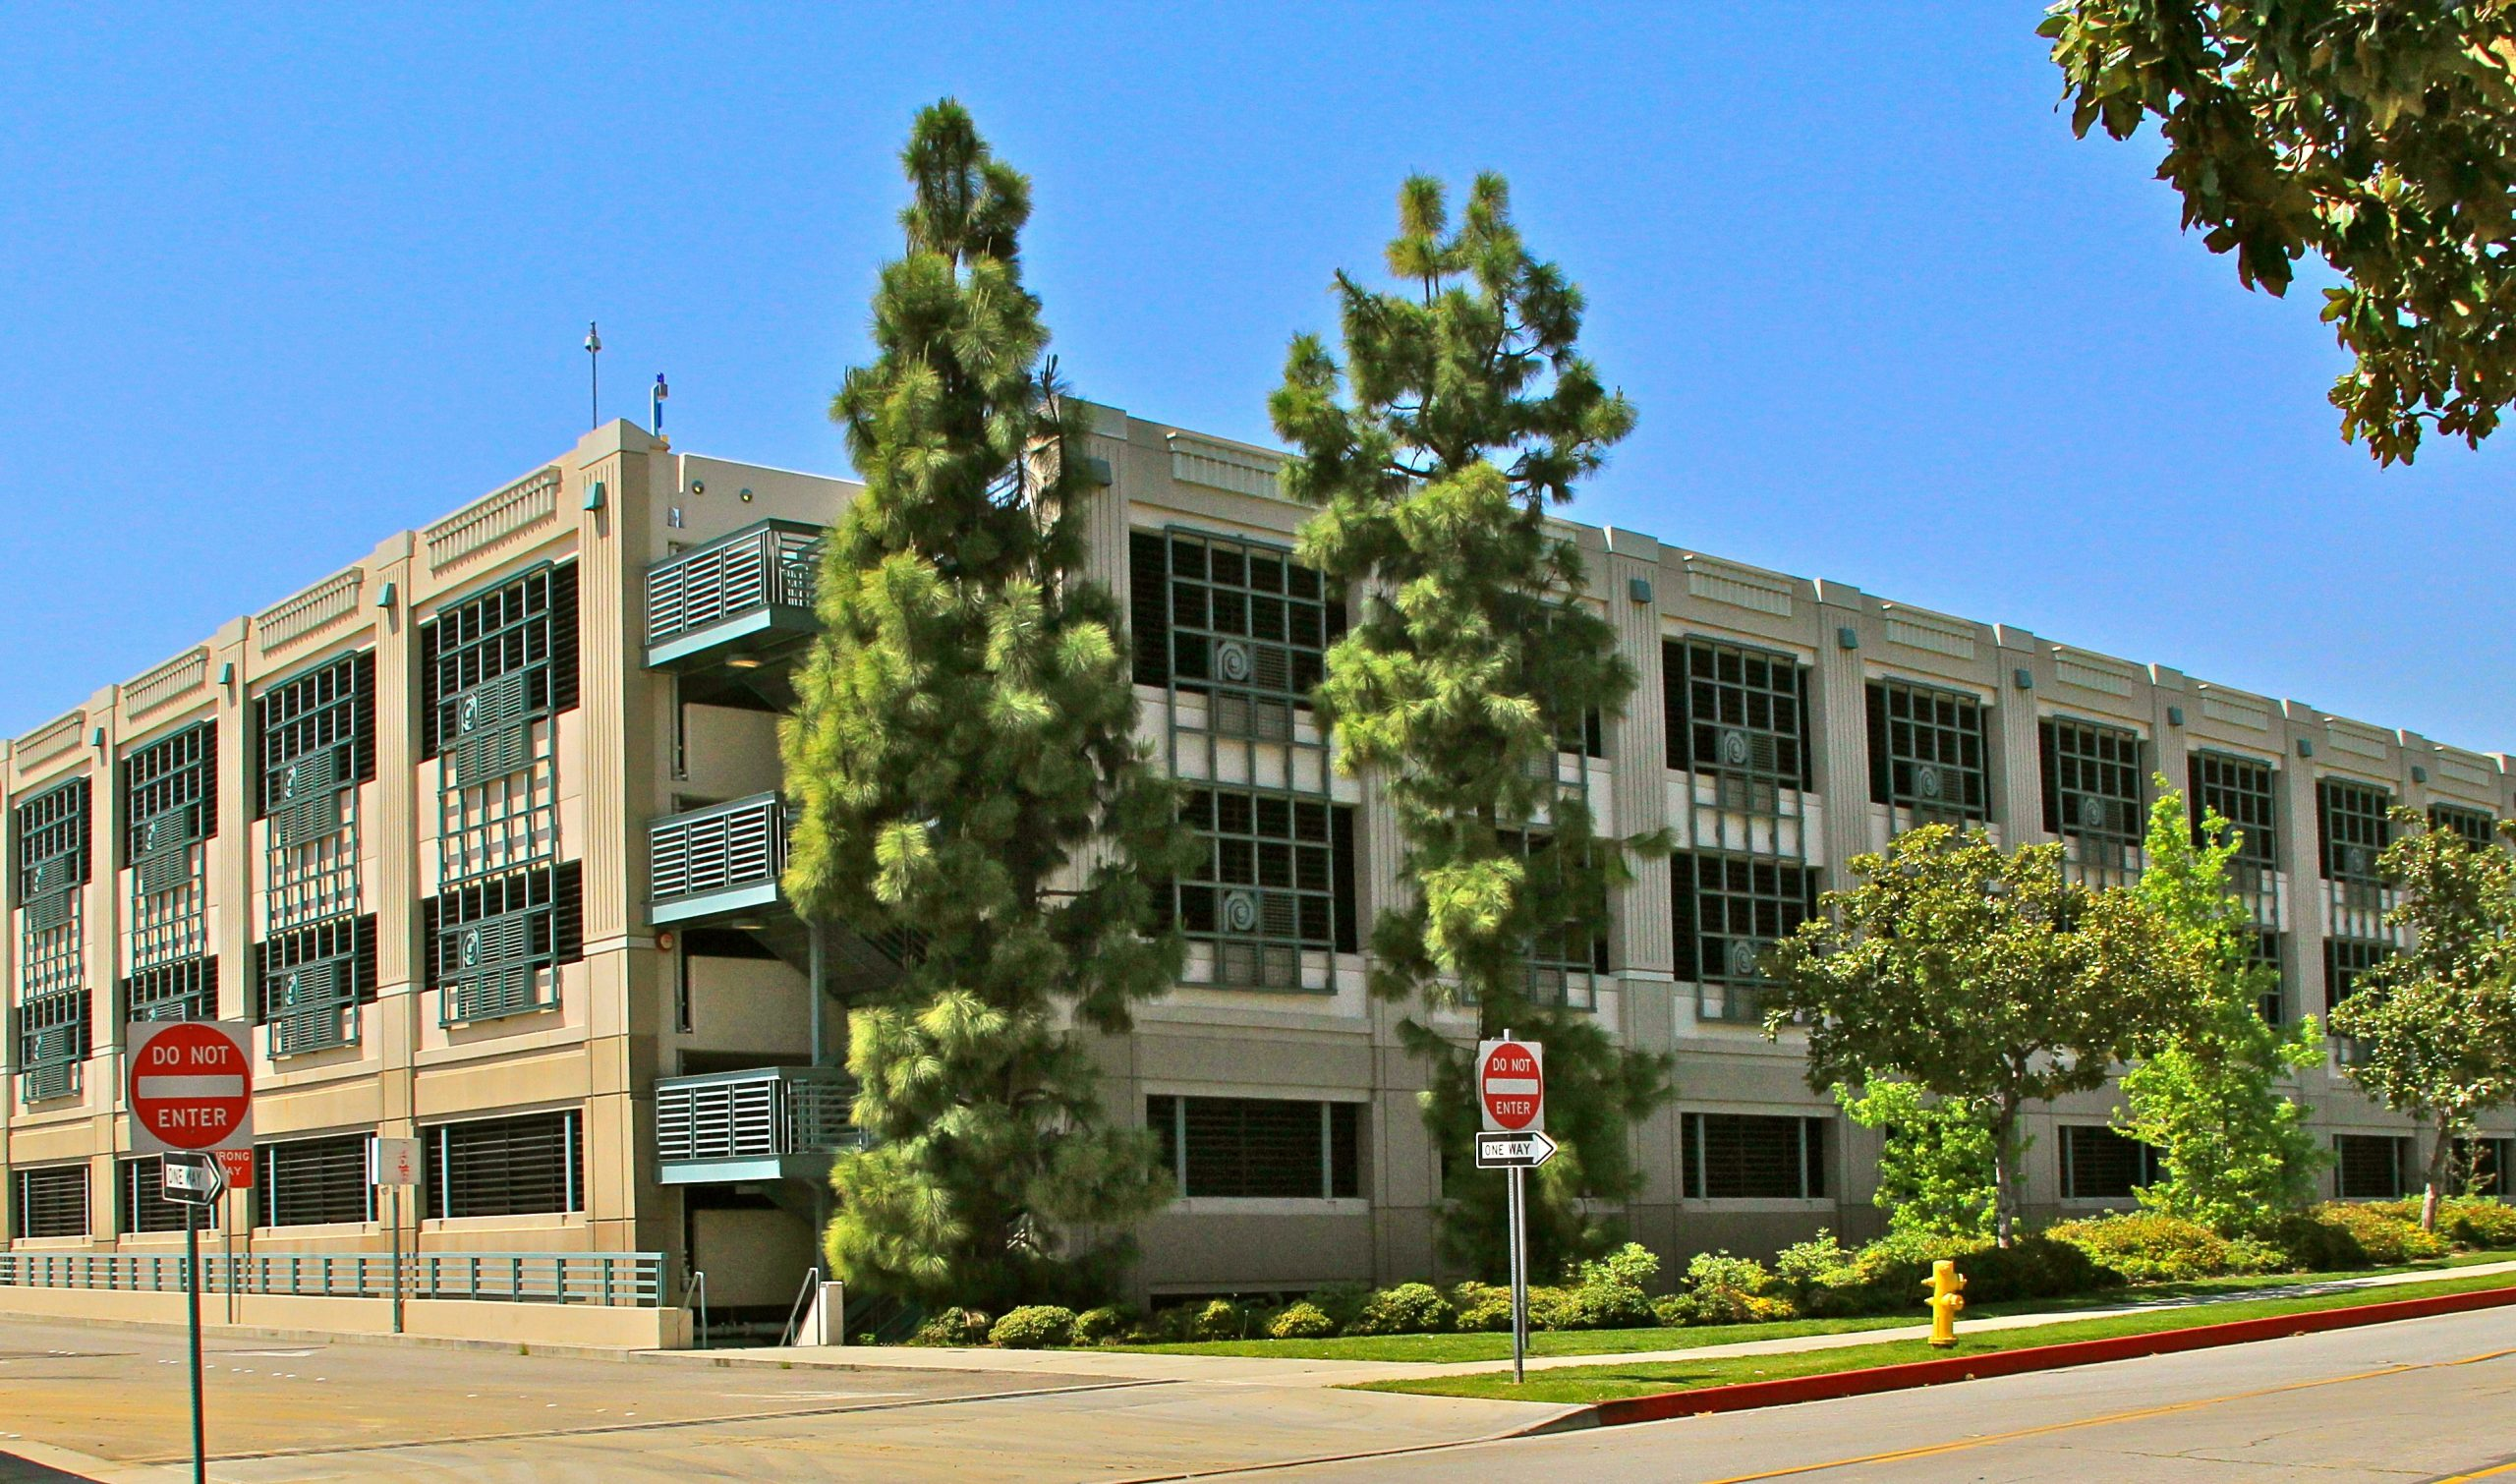 Pasadena City College Parking Structure